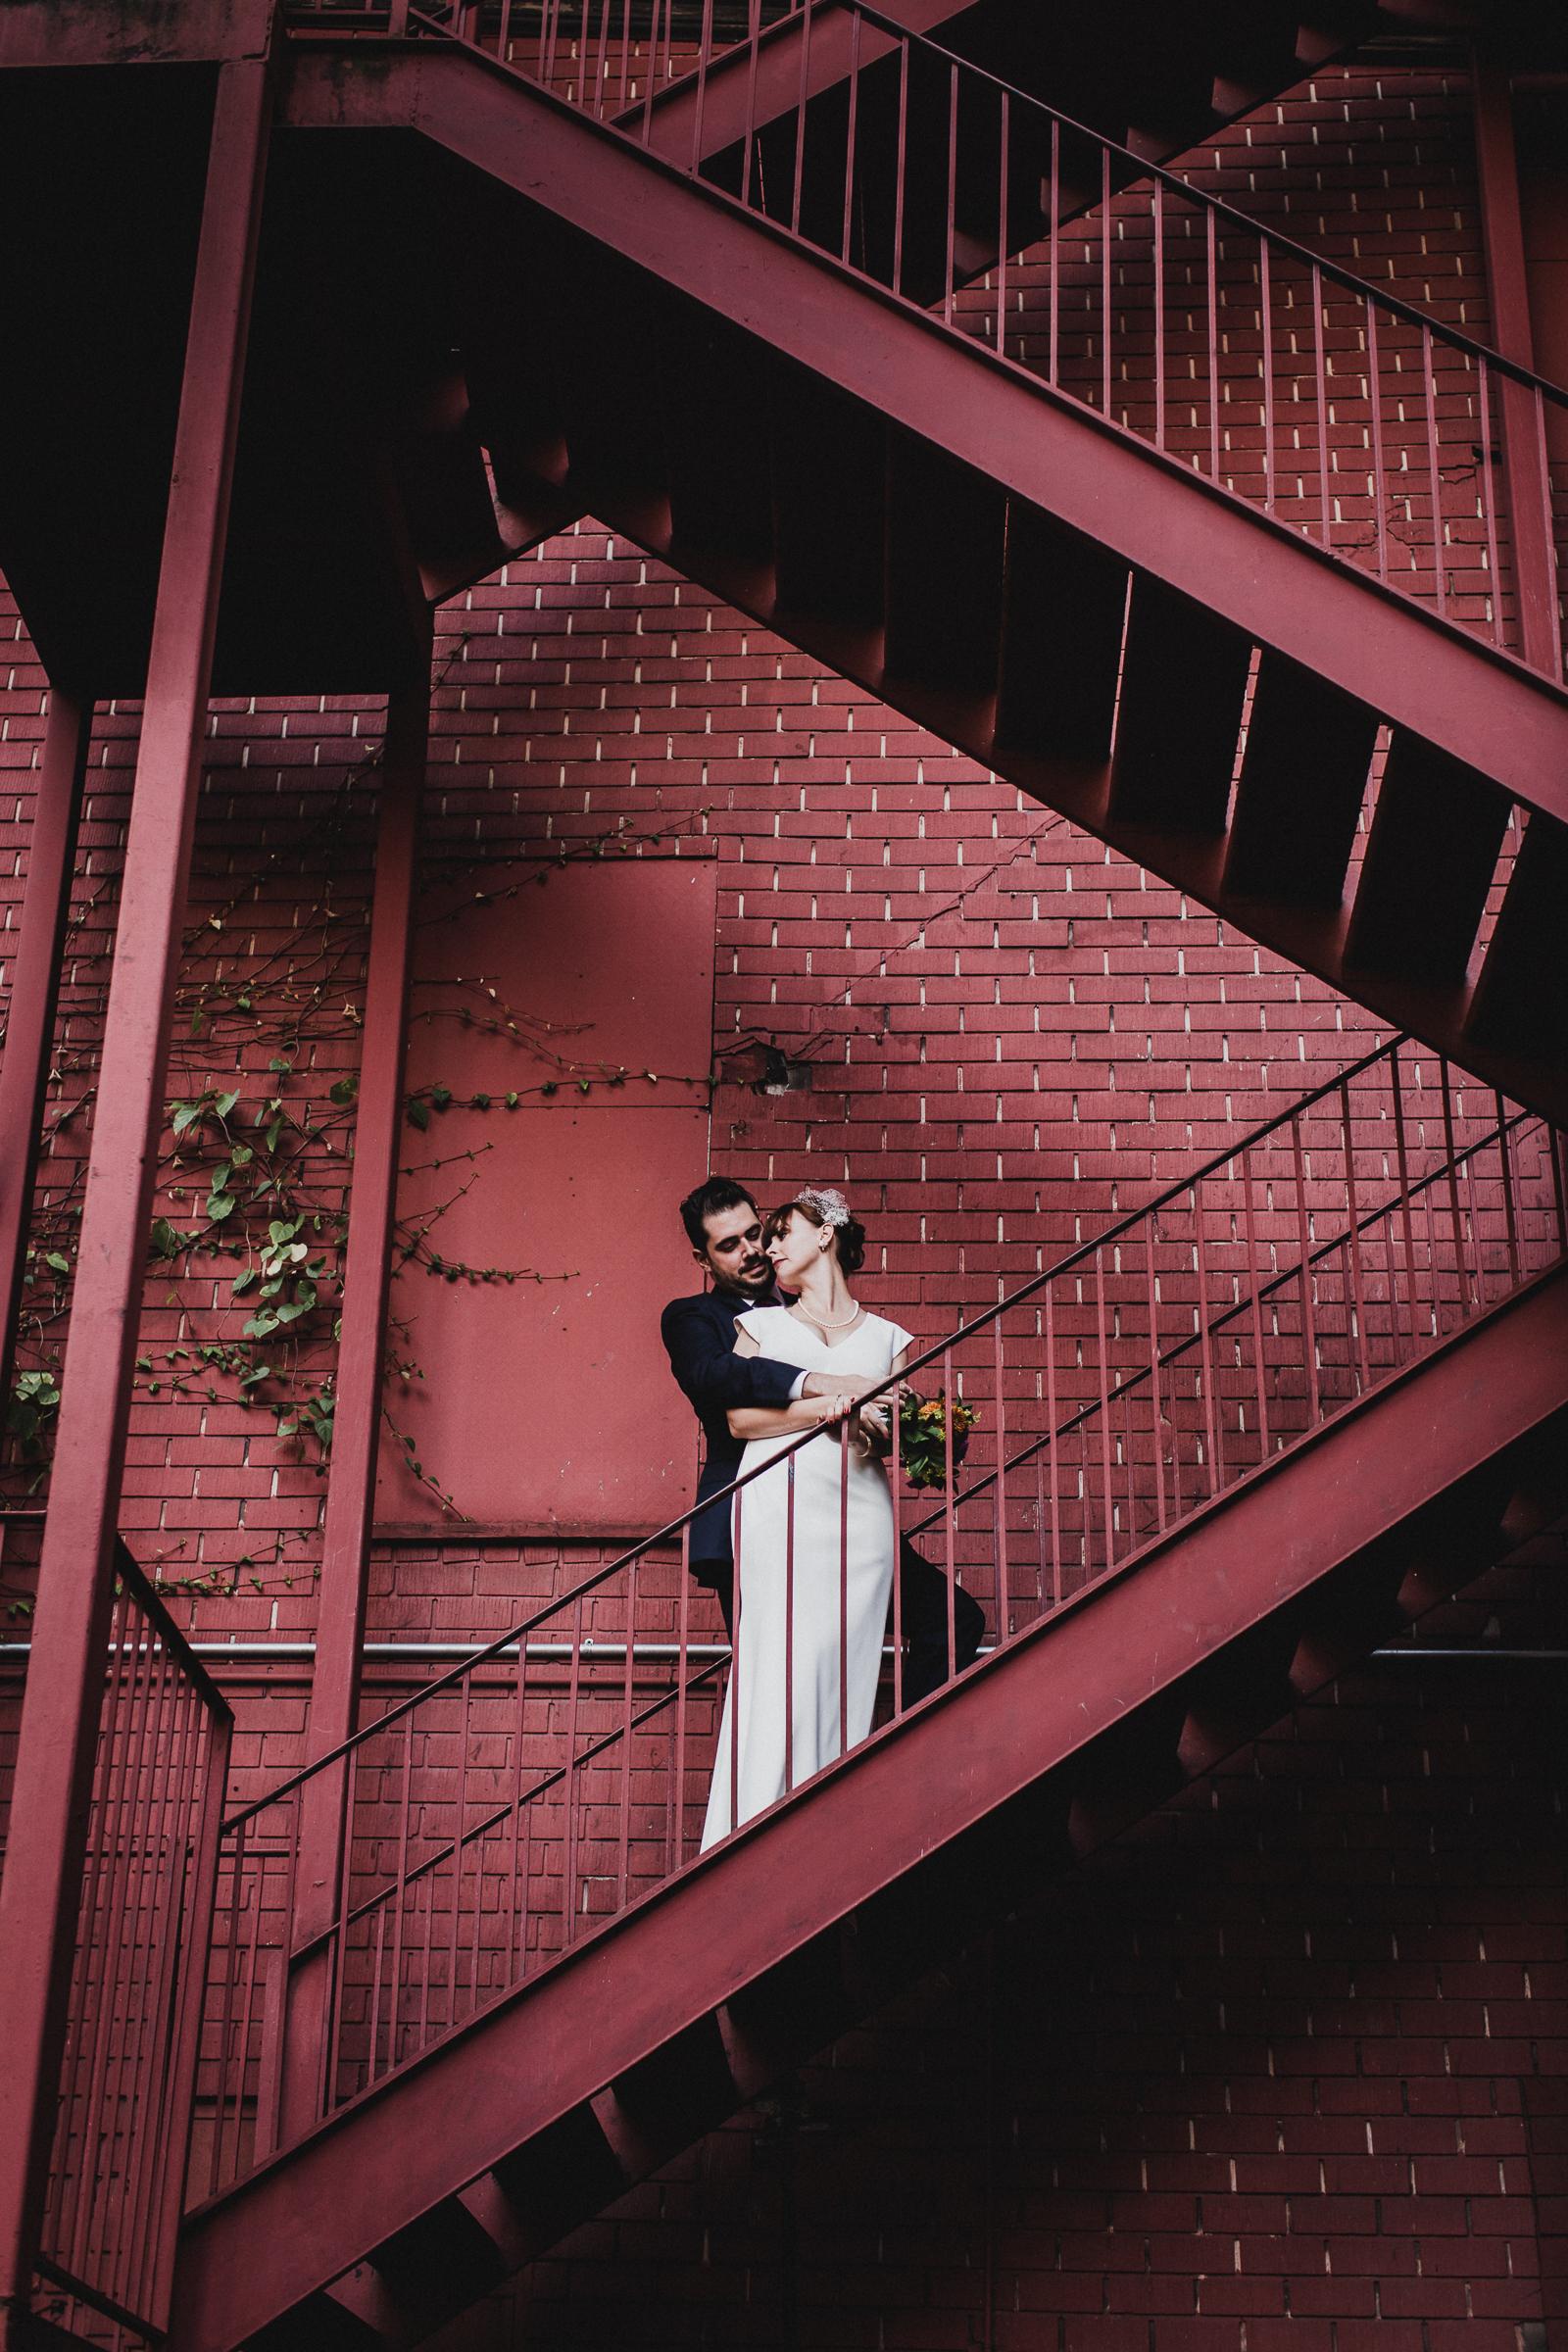 New-York-Documentary-Wedding-Photography-Best-Of-2017-by-Elvira-Kalviste-Photography-130.jpg